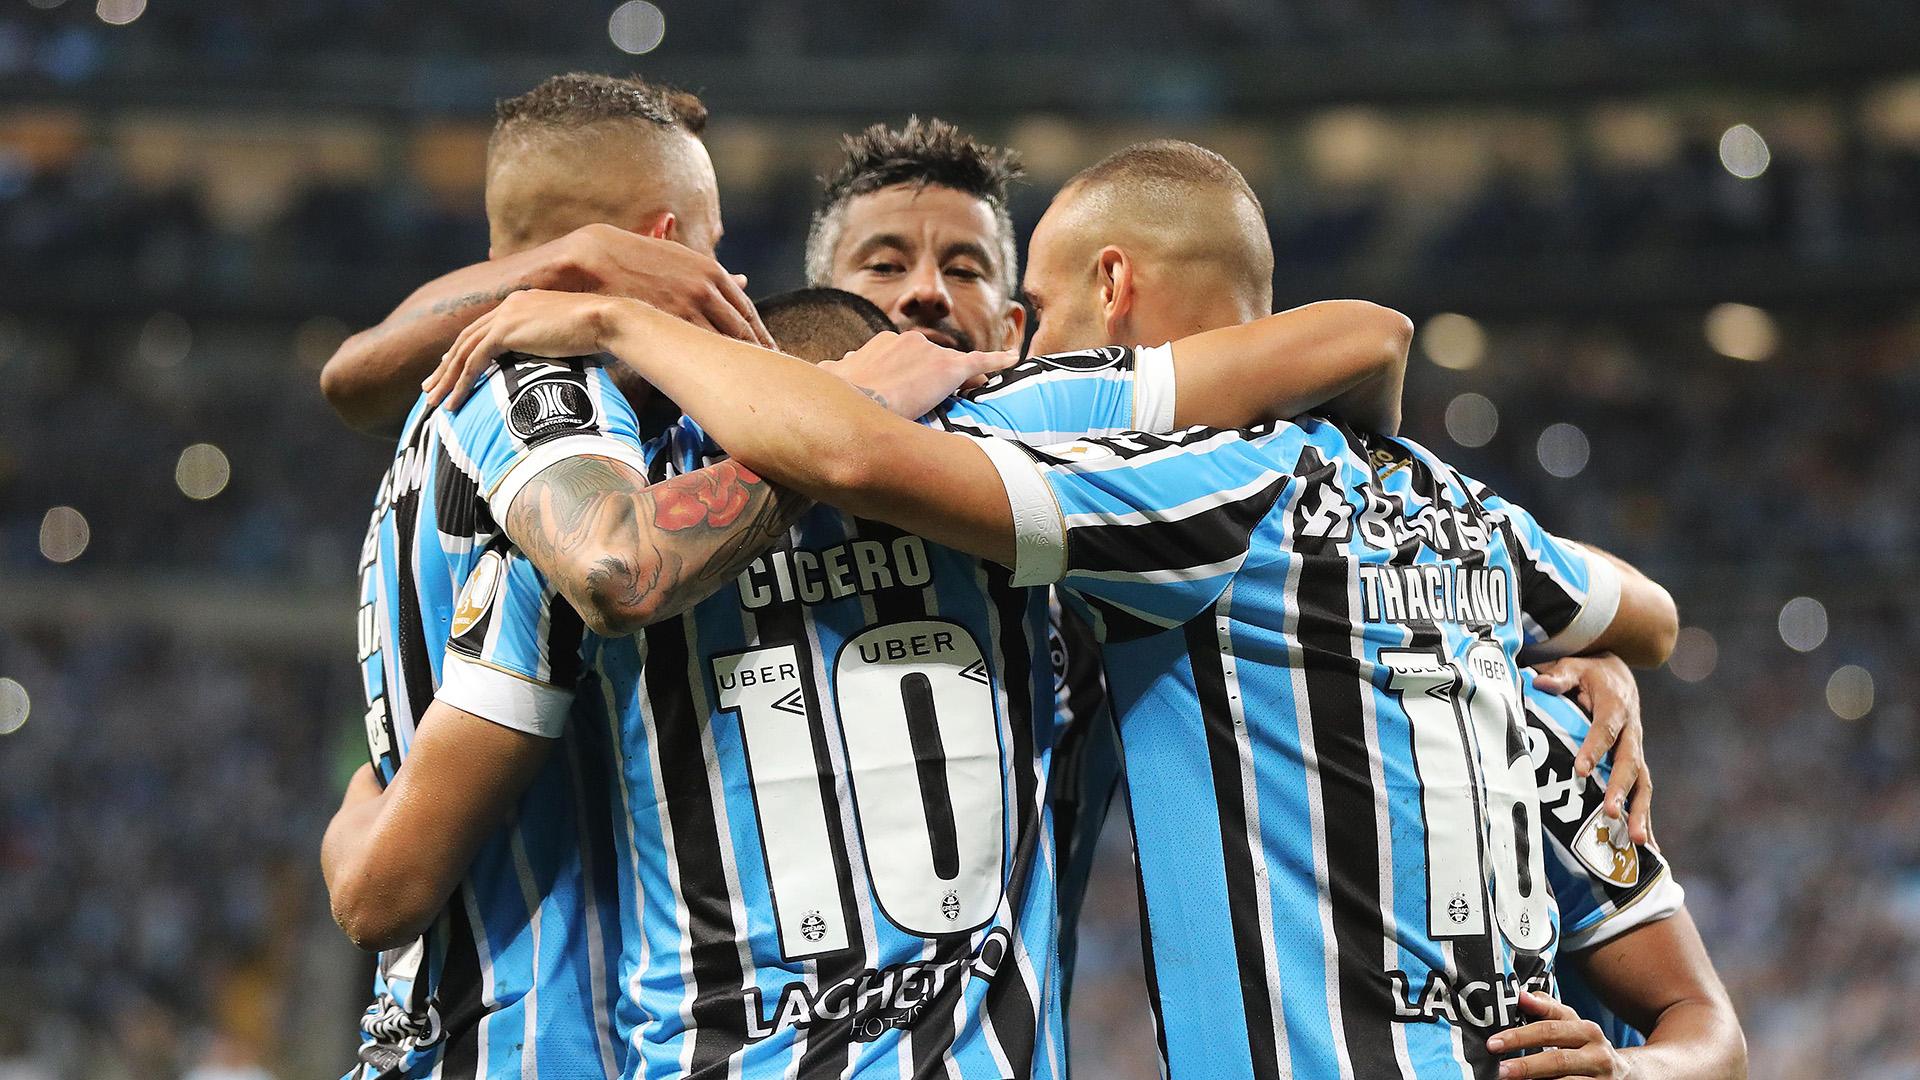 Léo Moura Cícero Grêmio Atlético Tucumán Copa Libertadores 02102018